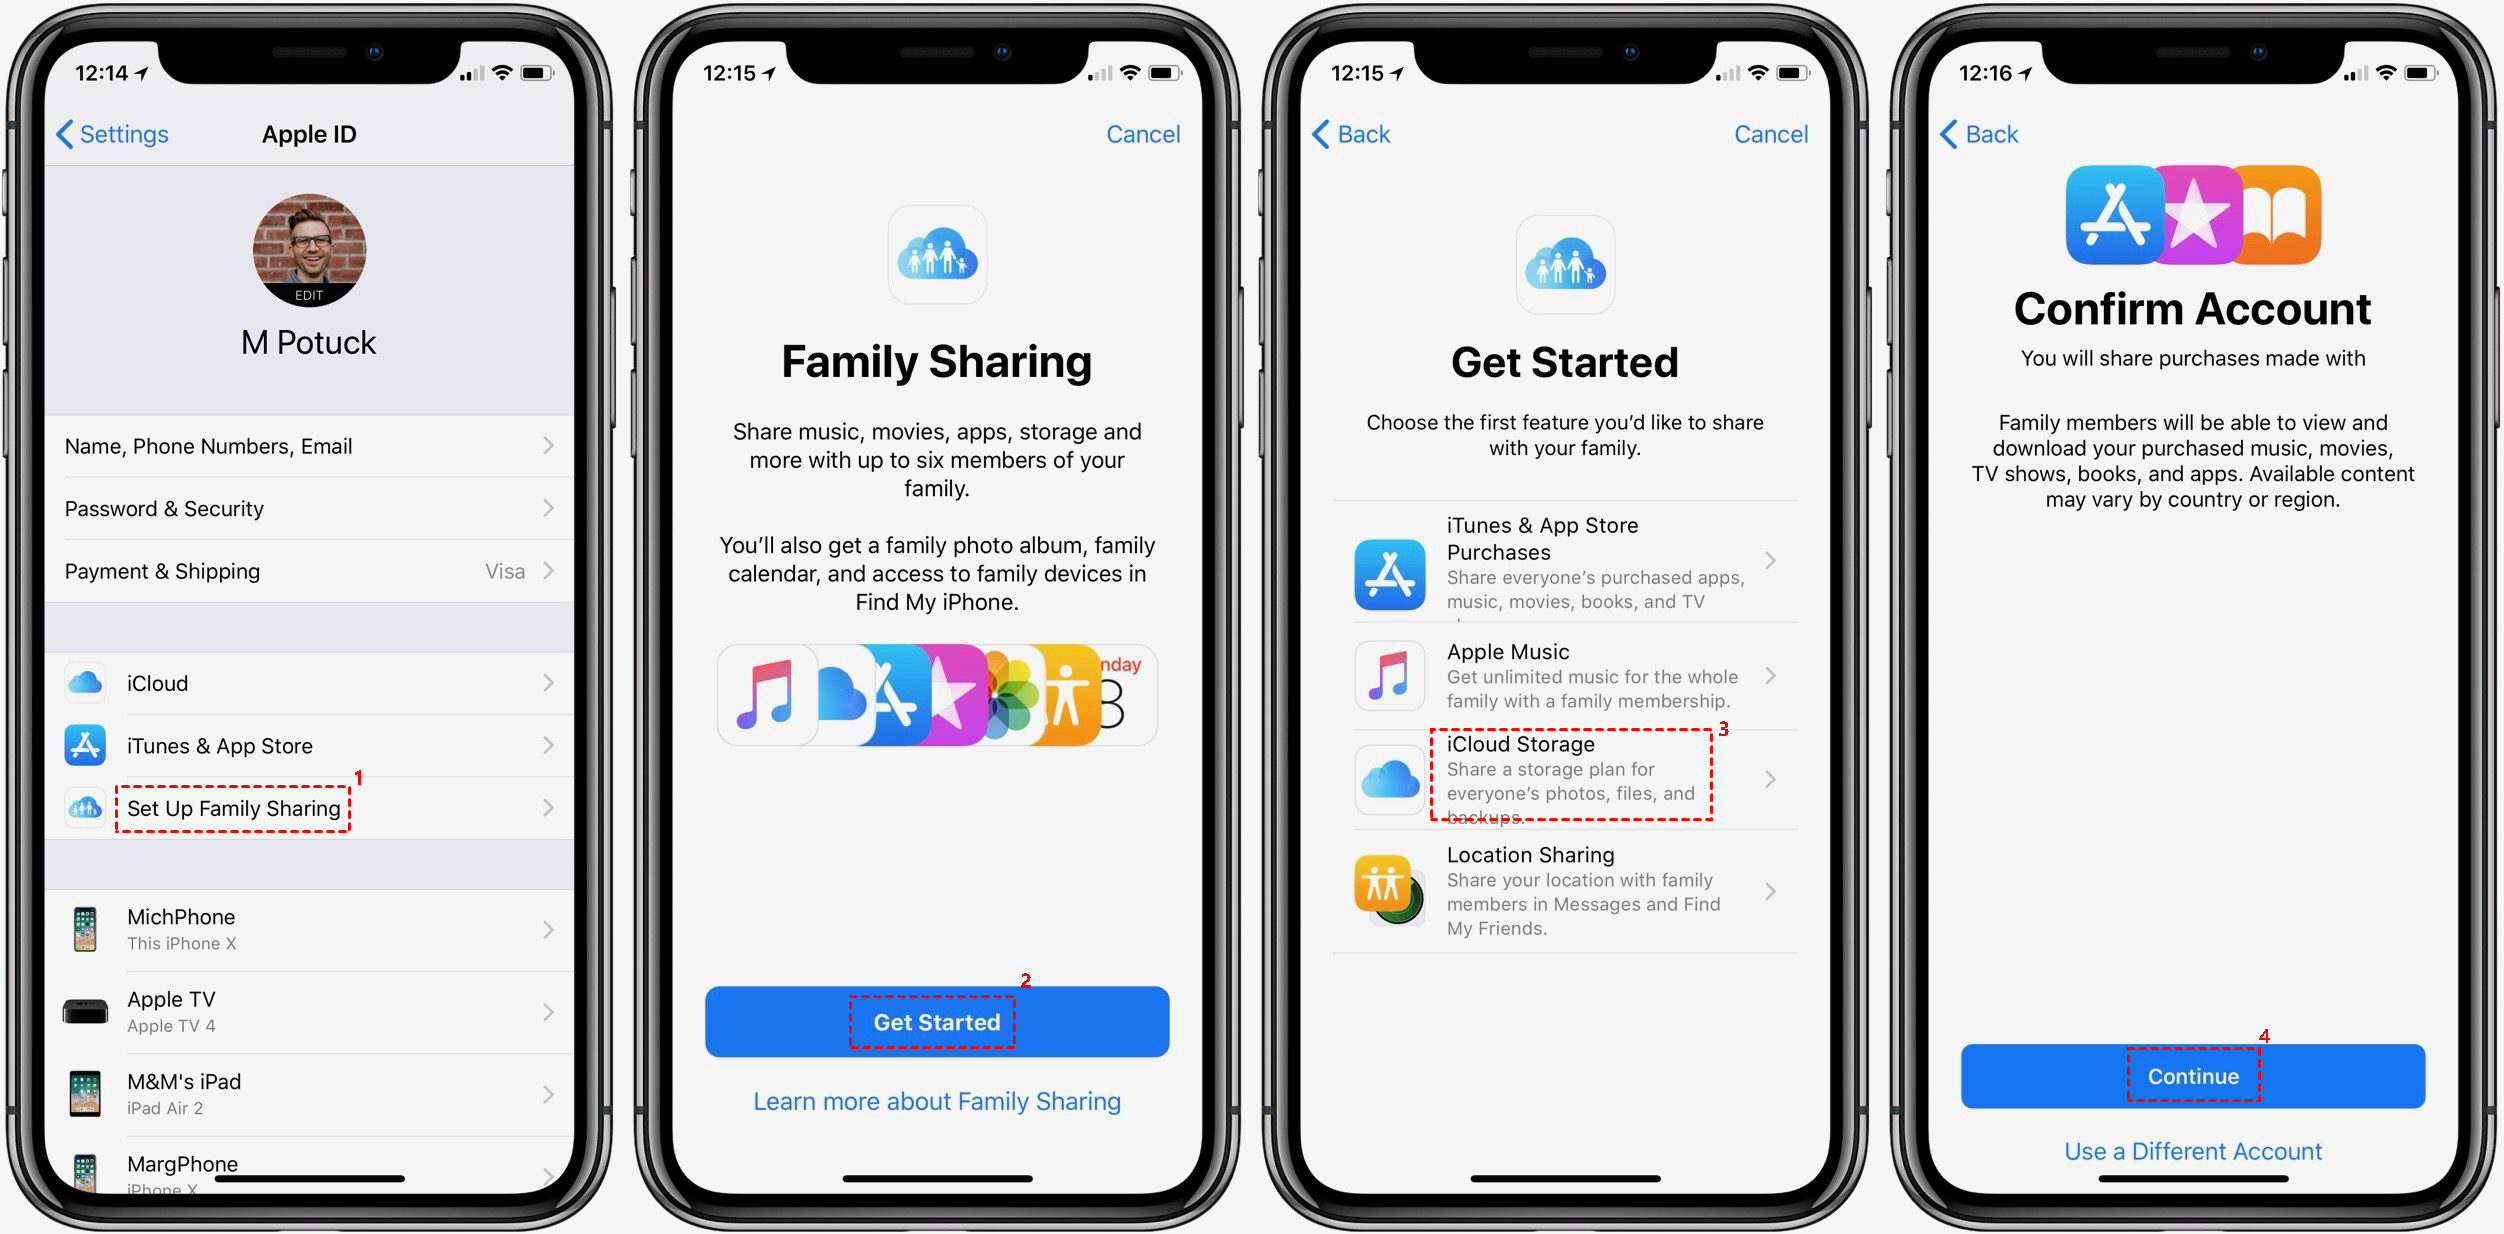 Family Sharing Icloud